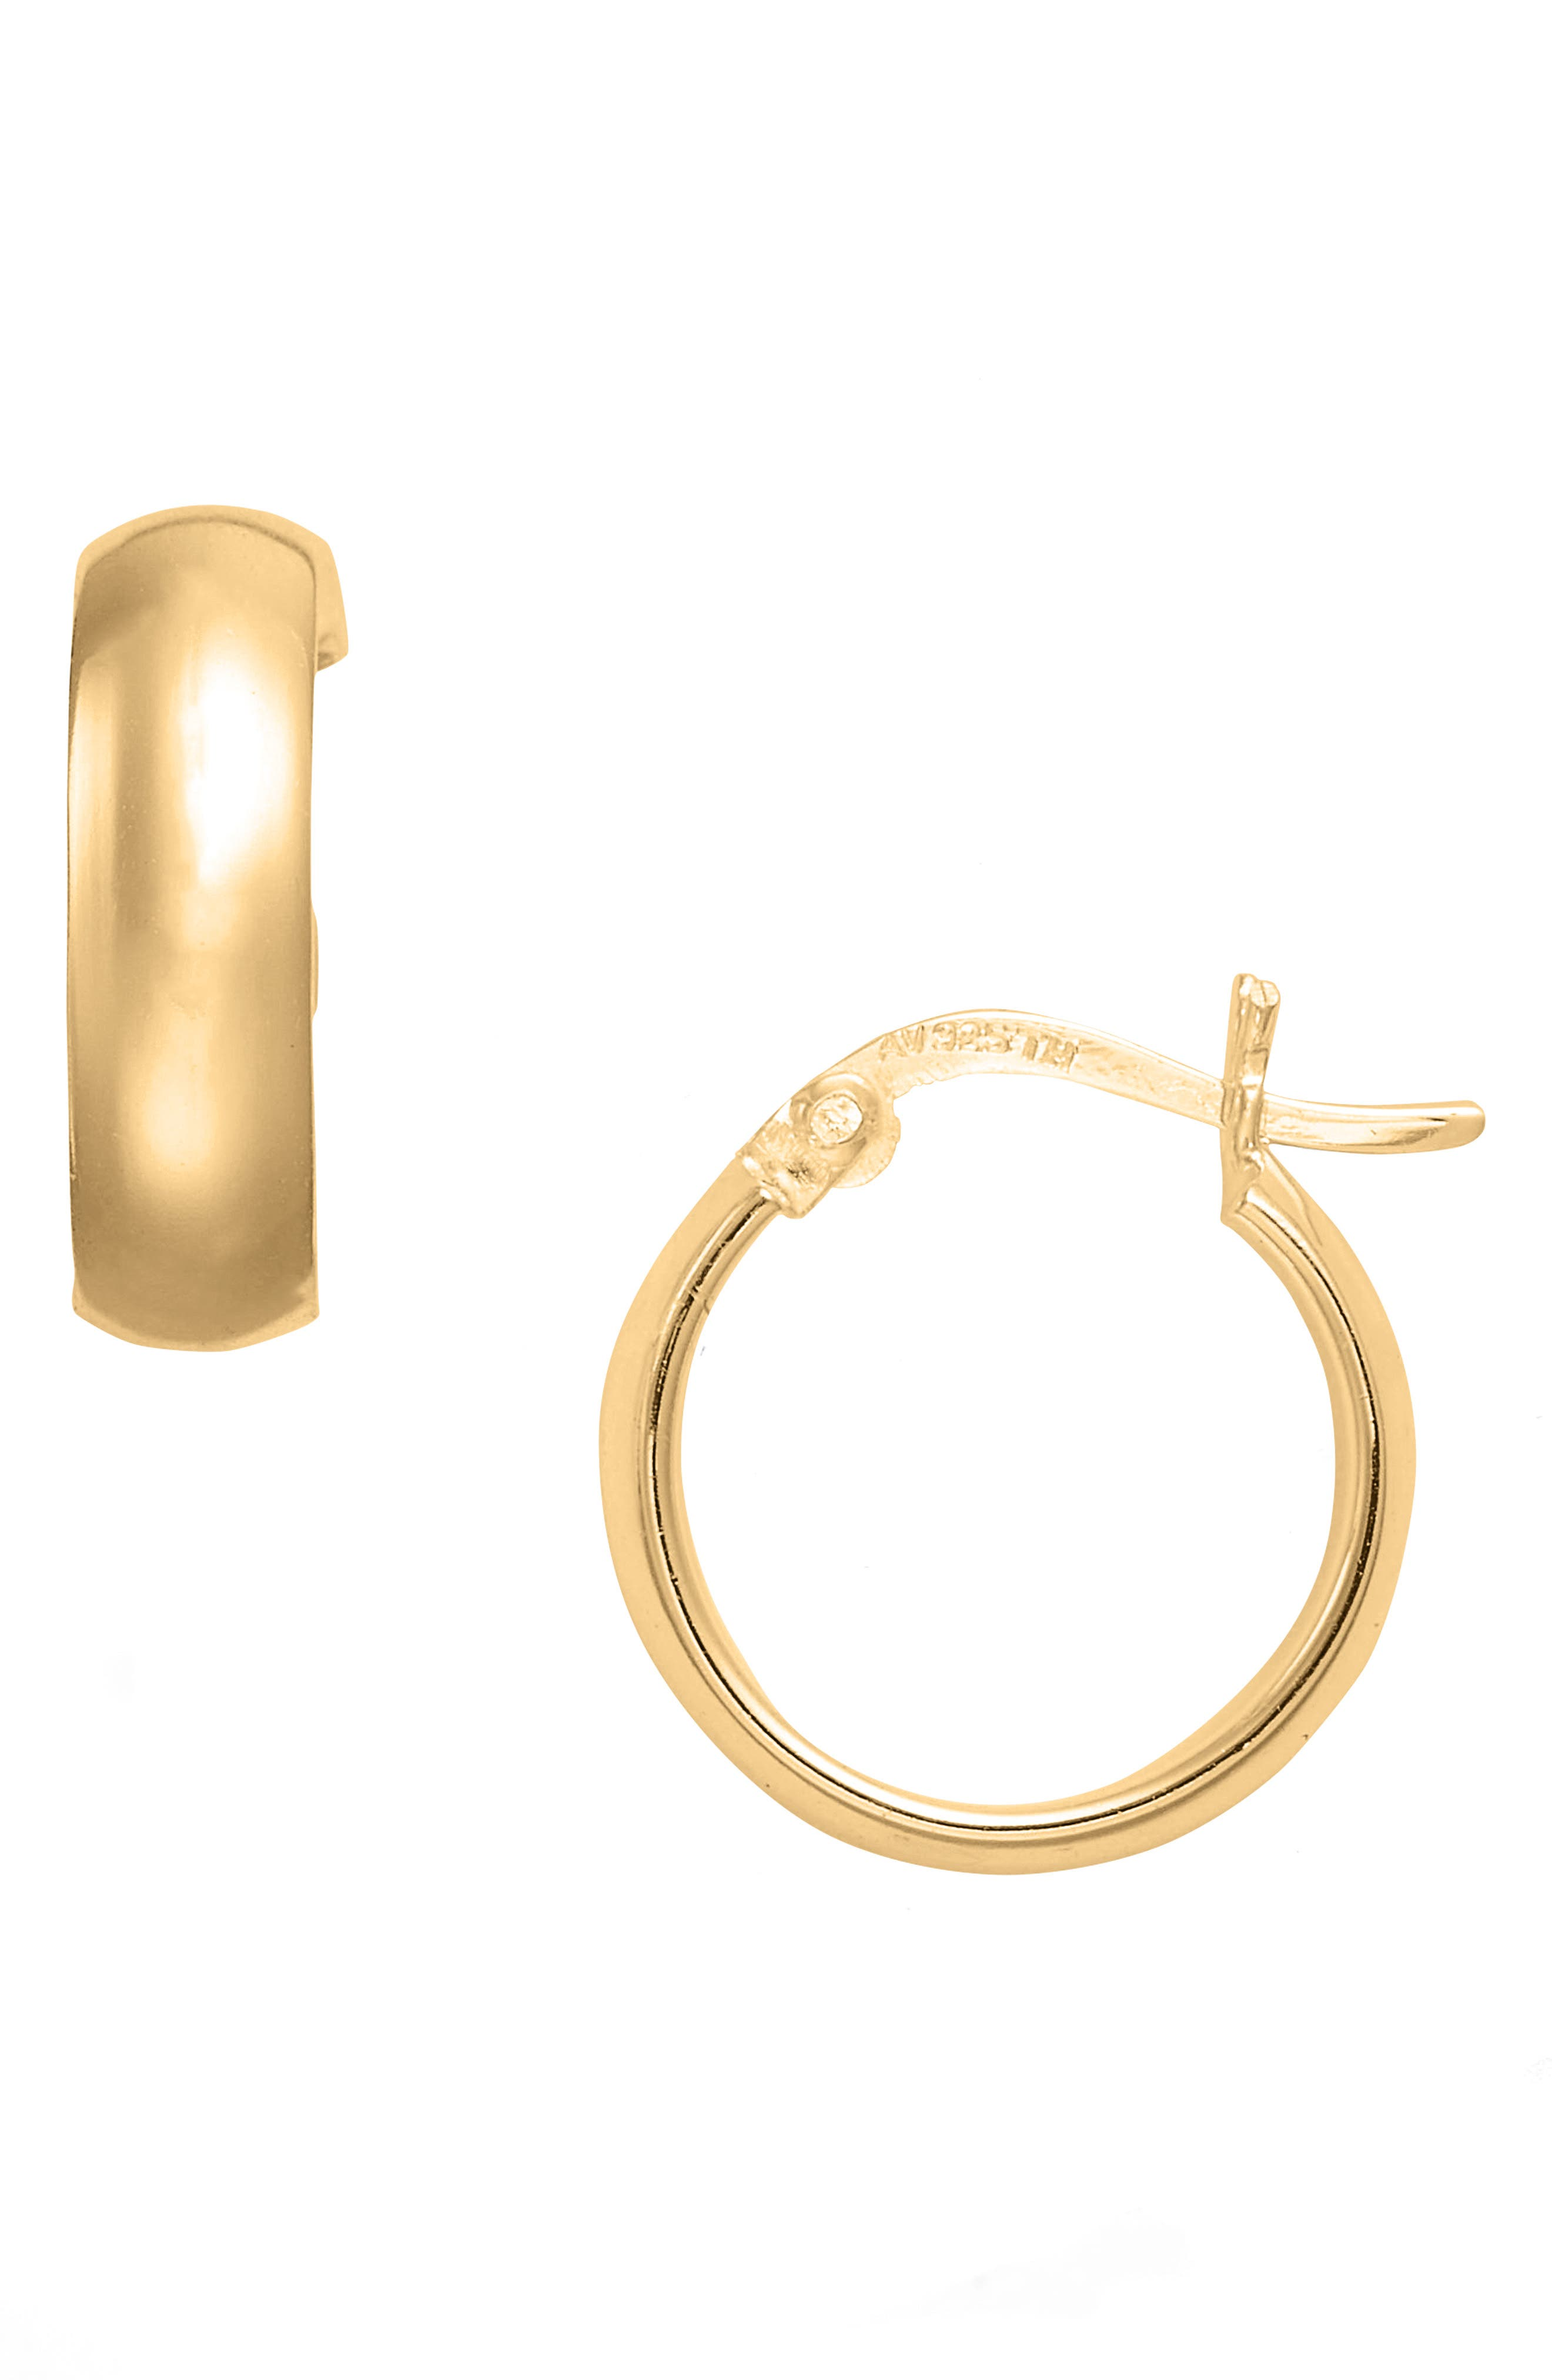 Argento Vivo Small Curved Hoop Earrings